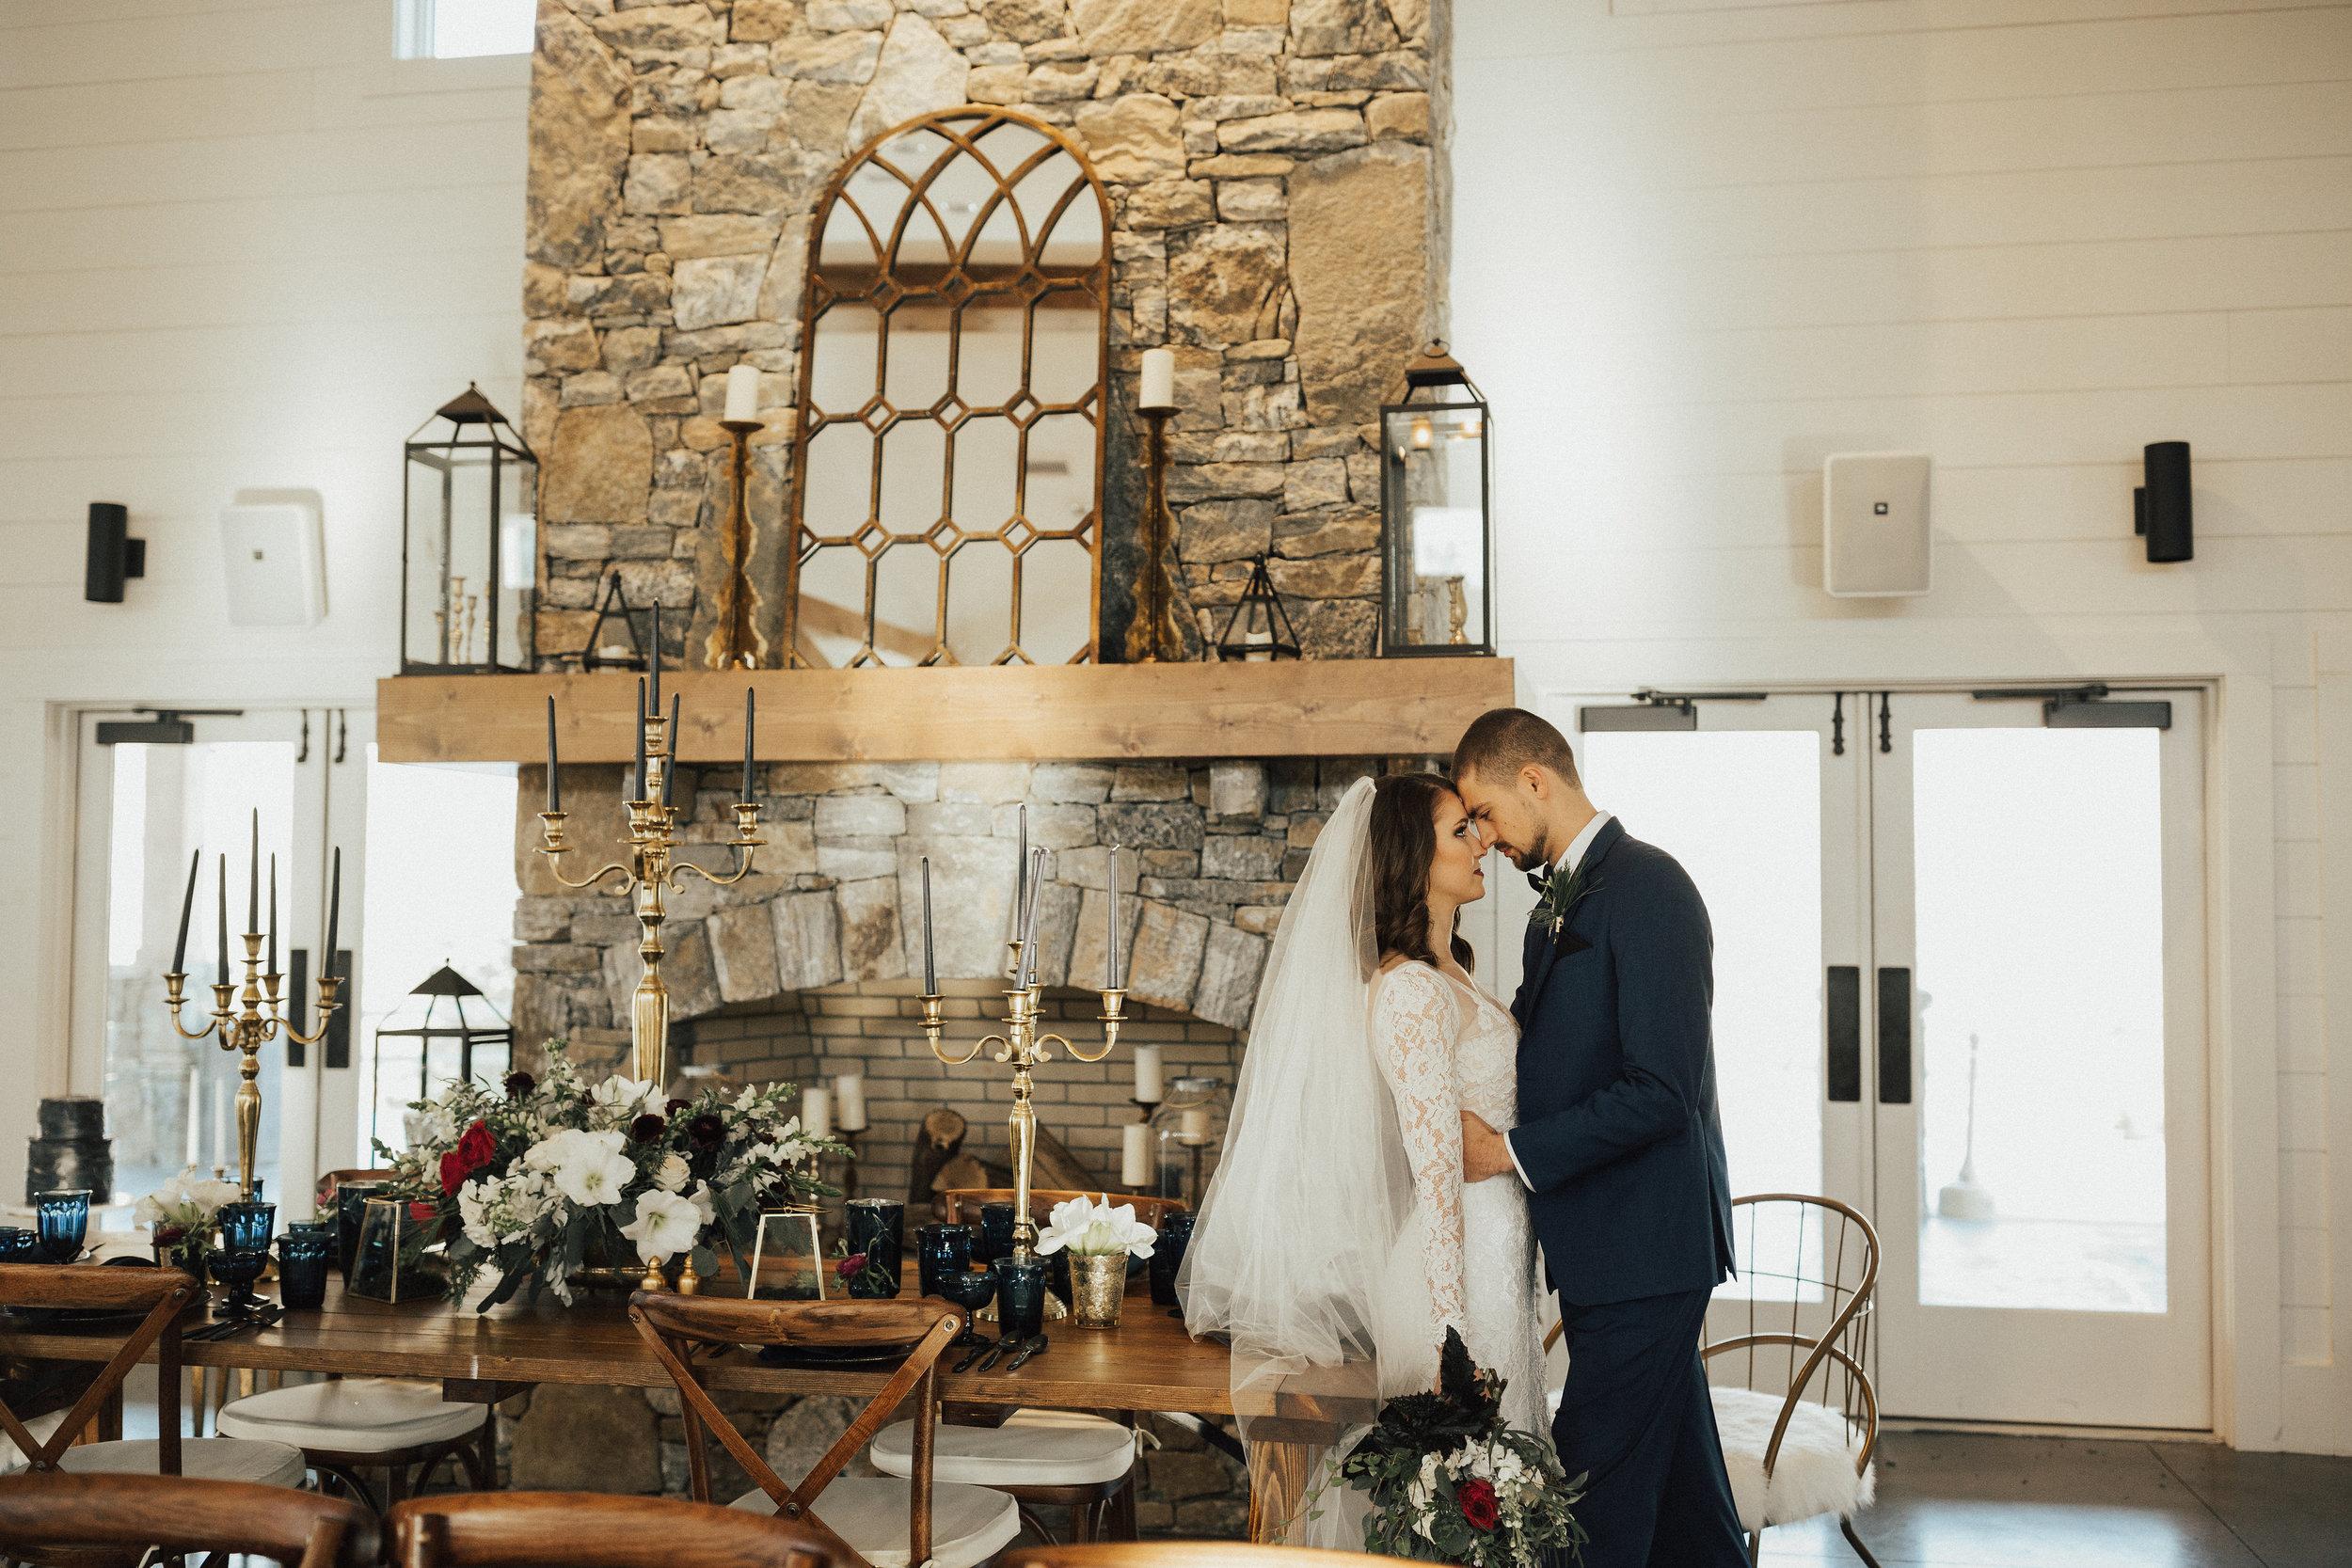 Joy-Unscripted-Wedding-Styled-Shoot-Celestial-Winter-25.jpg